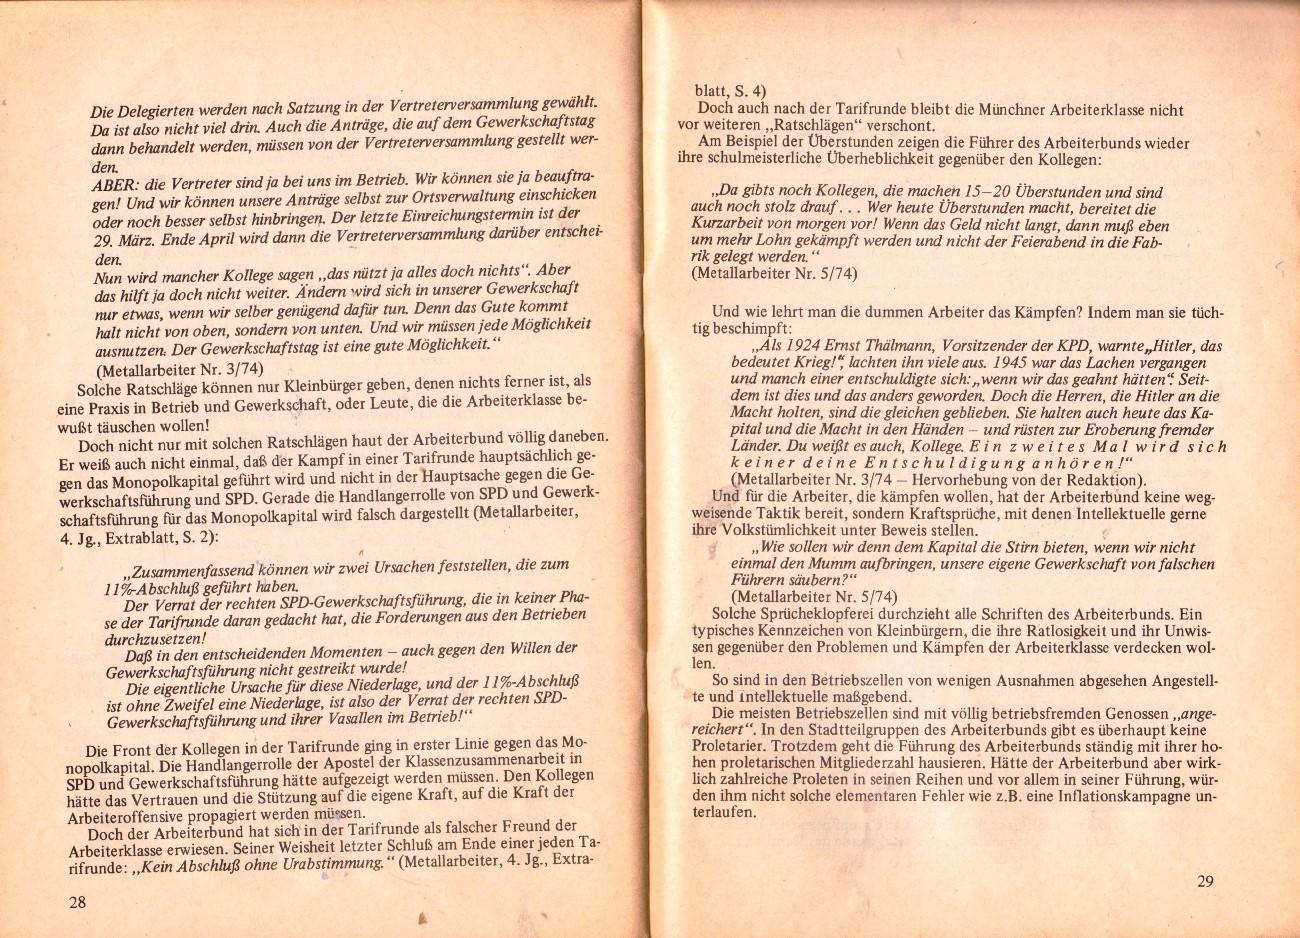 Muenchen_KABD_1974_Kritik_des_AB_16